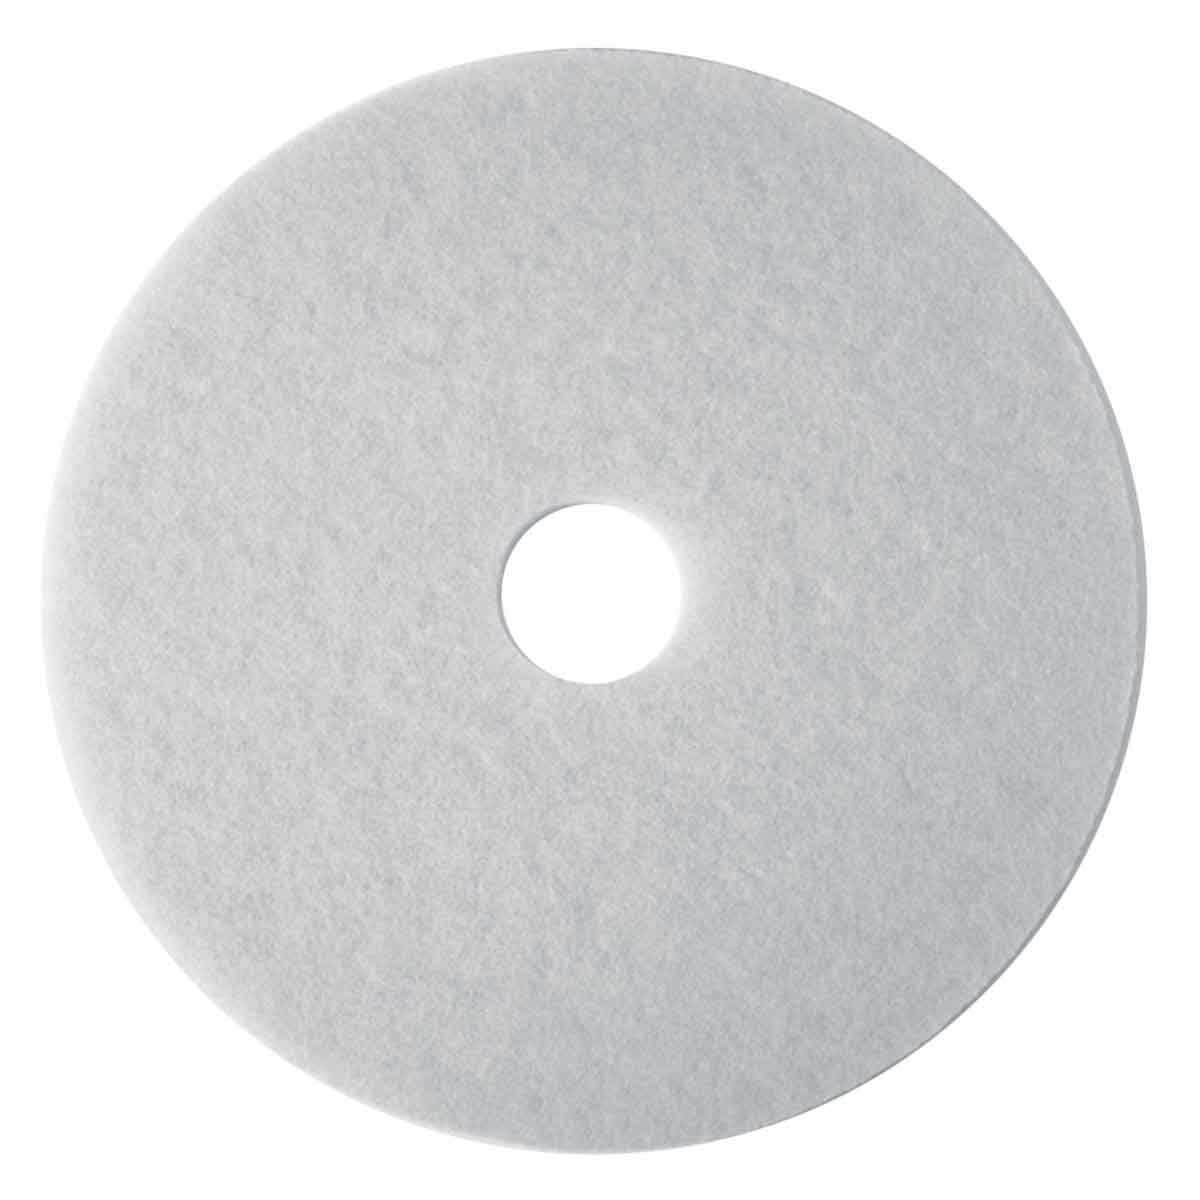 Hawk White Polishing Floor Pads